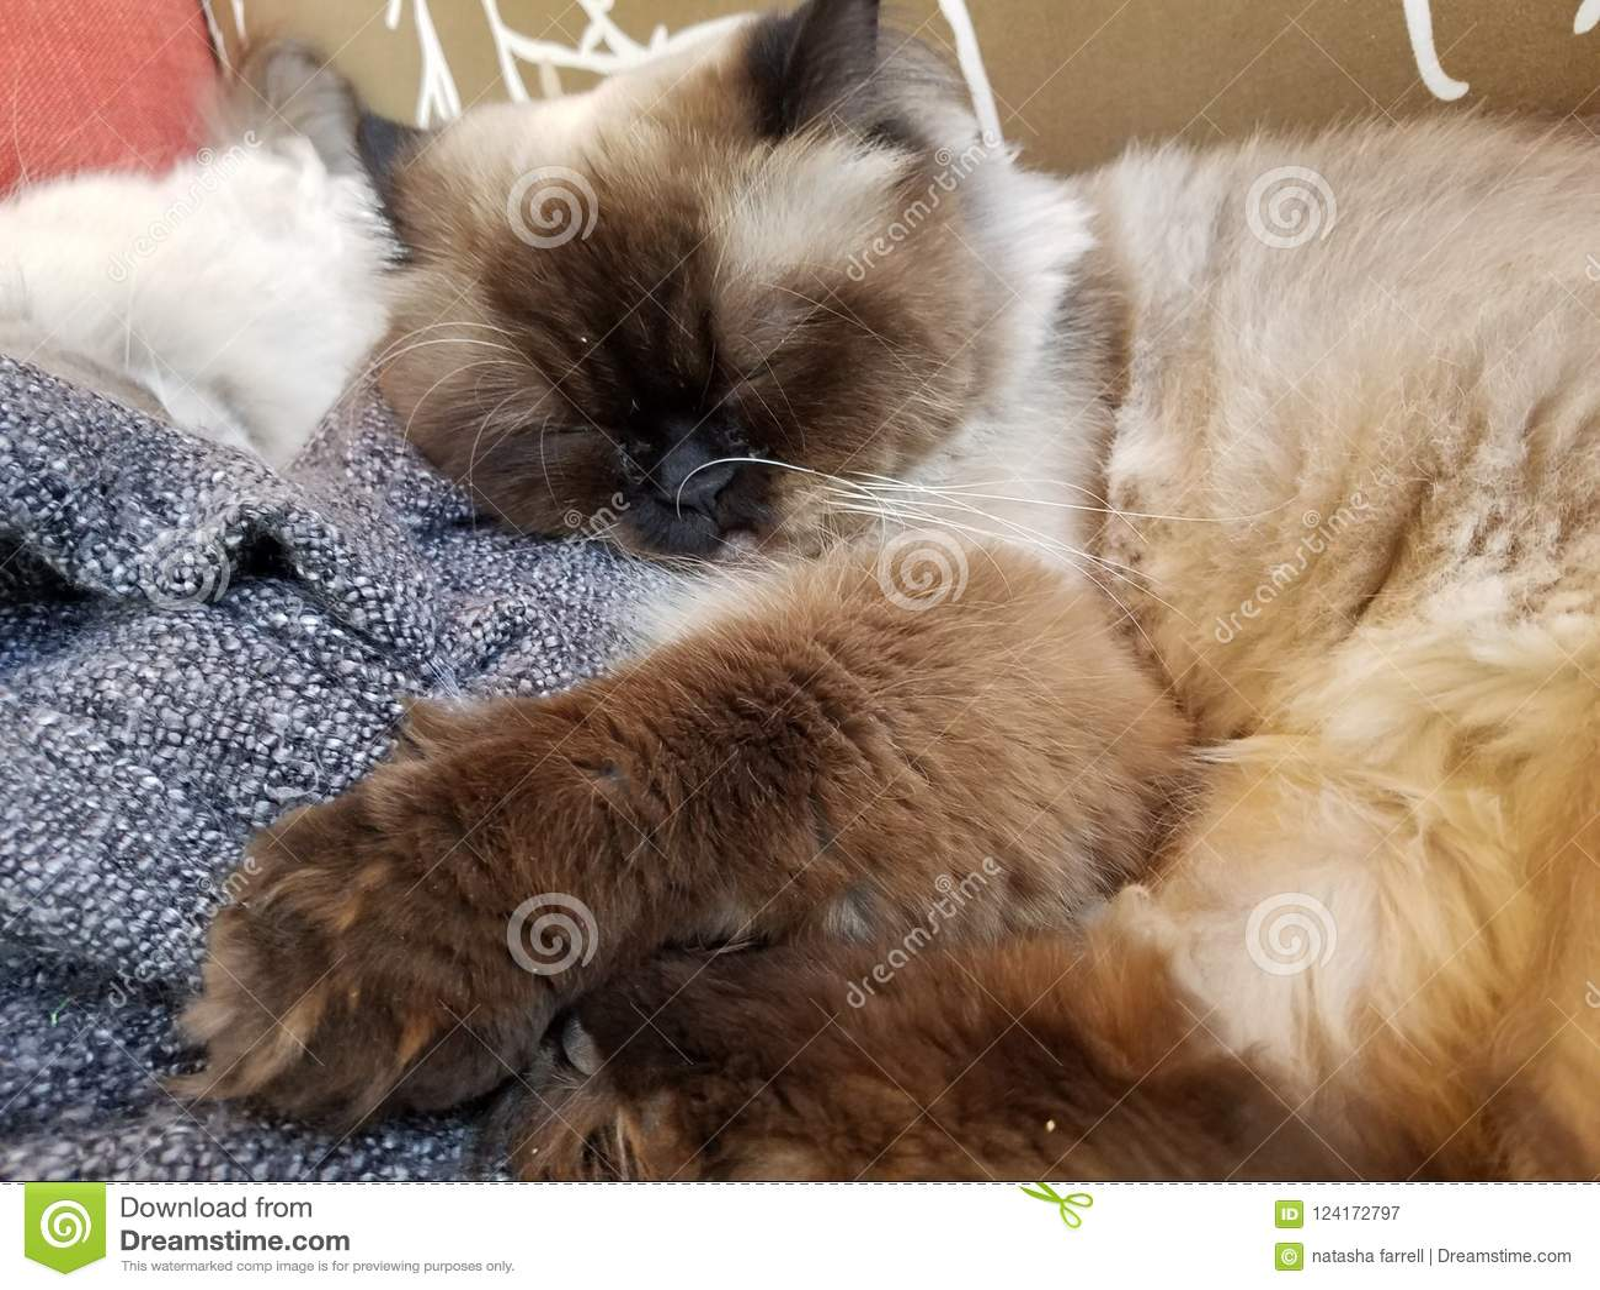 Himilayan cat